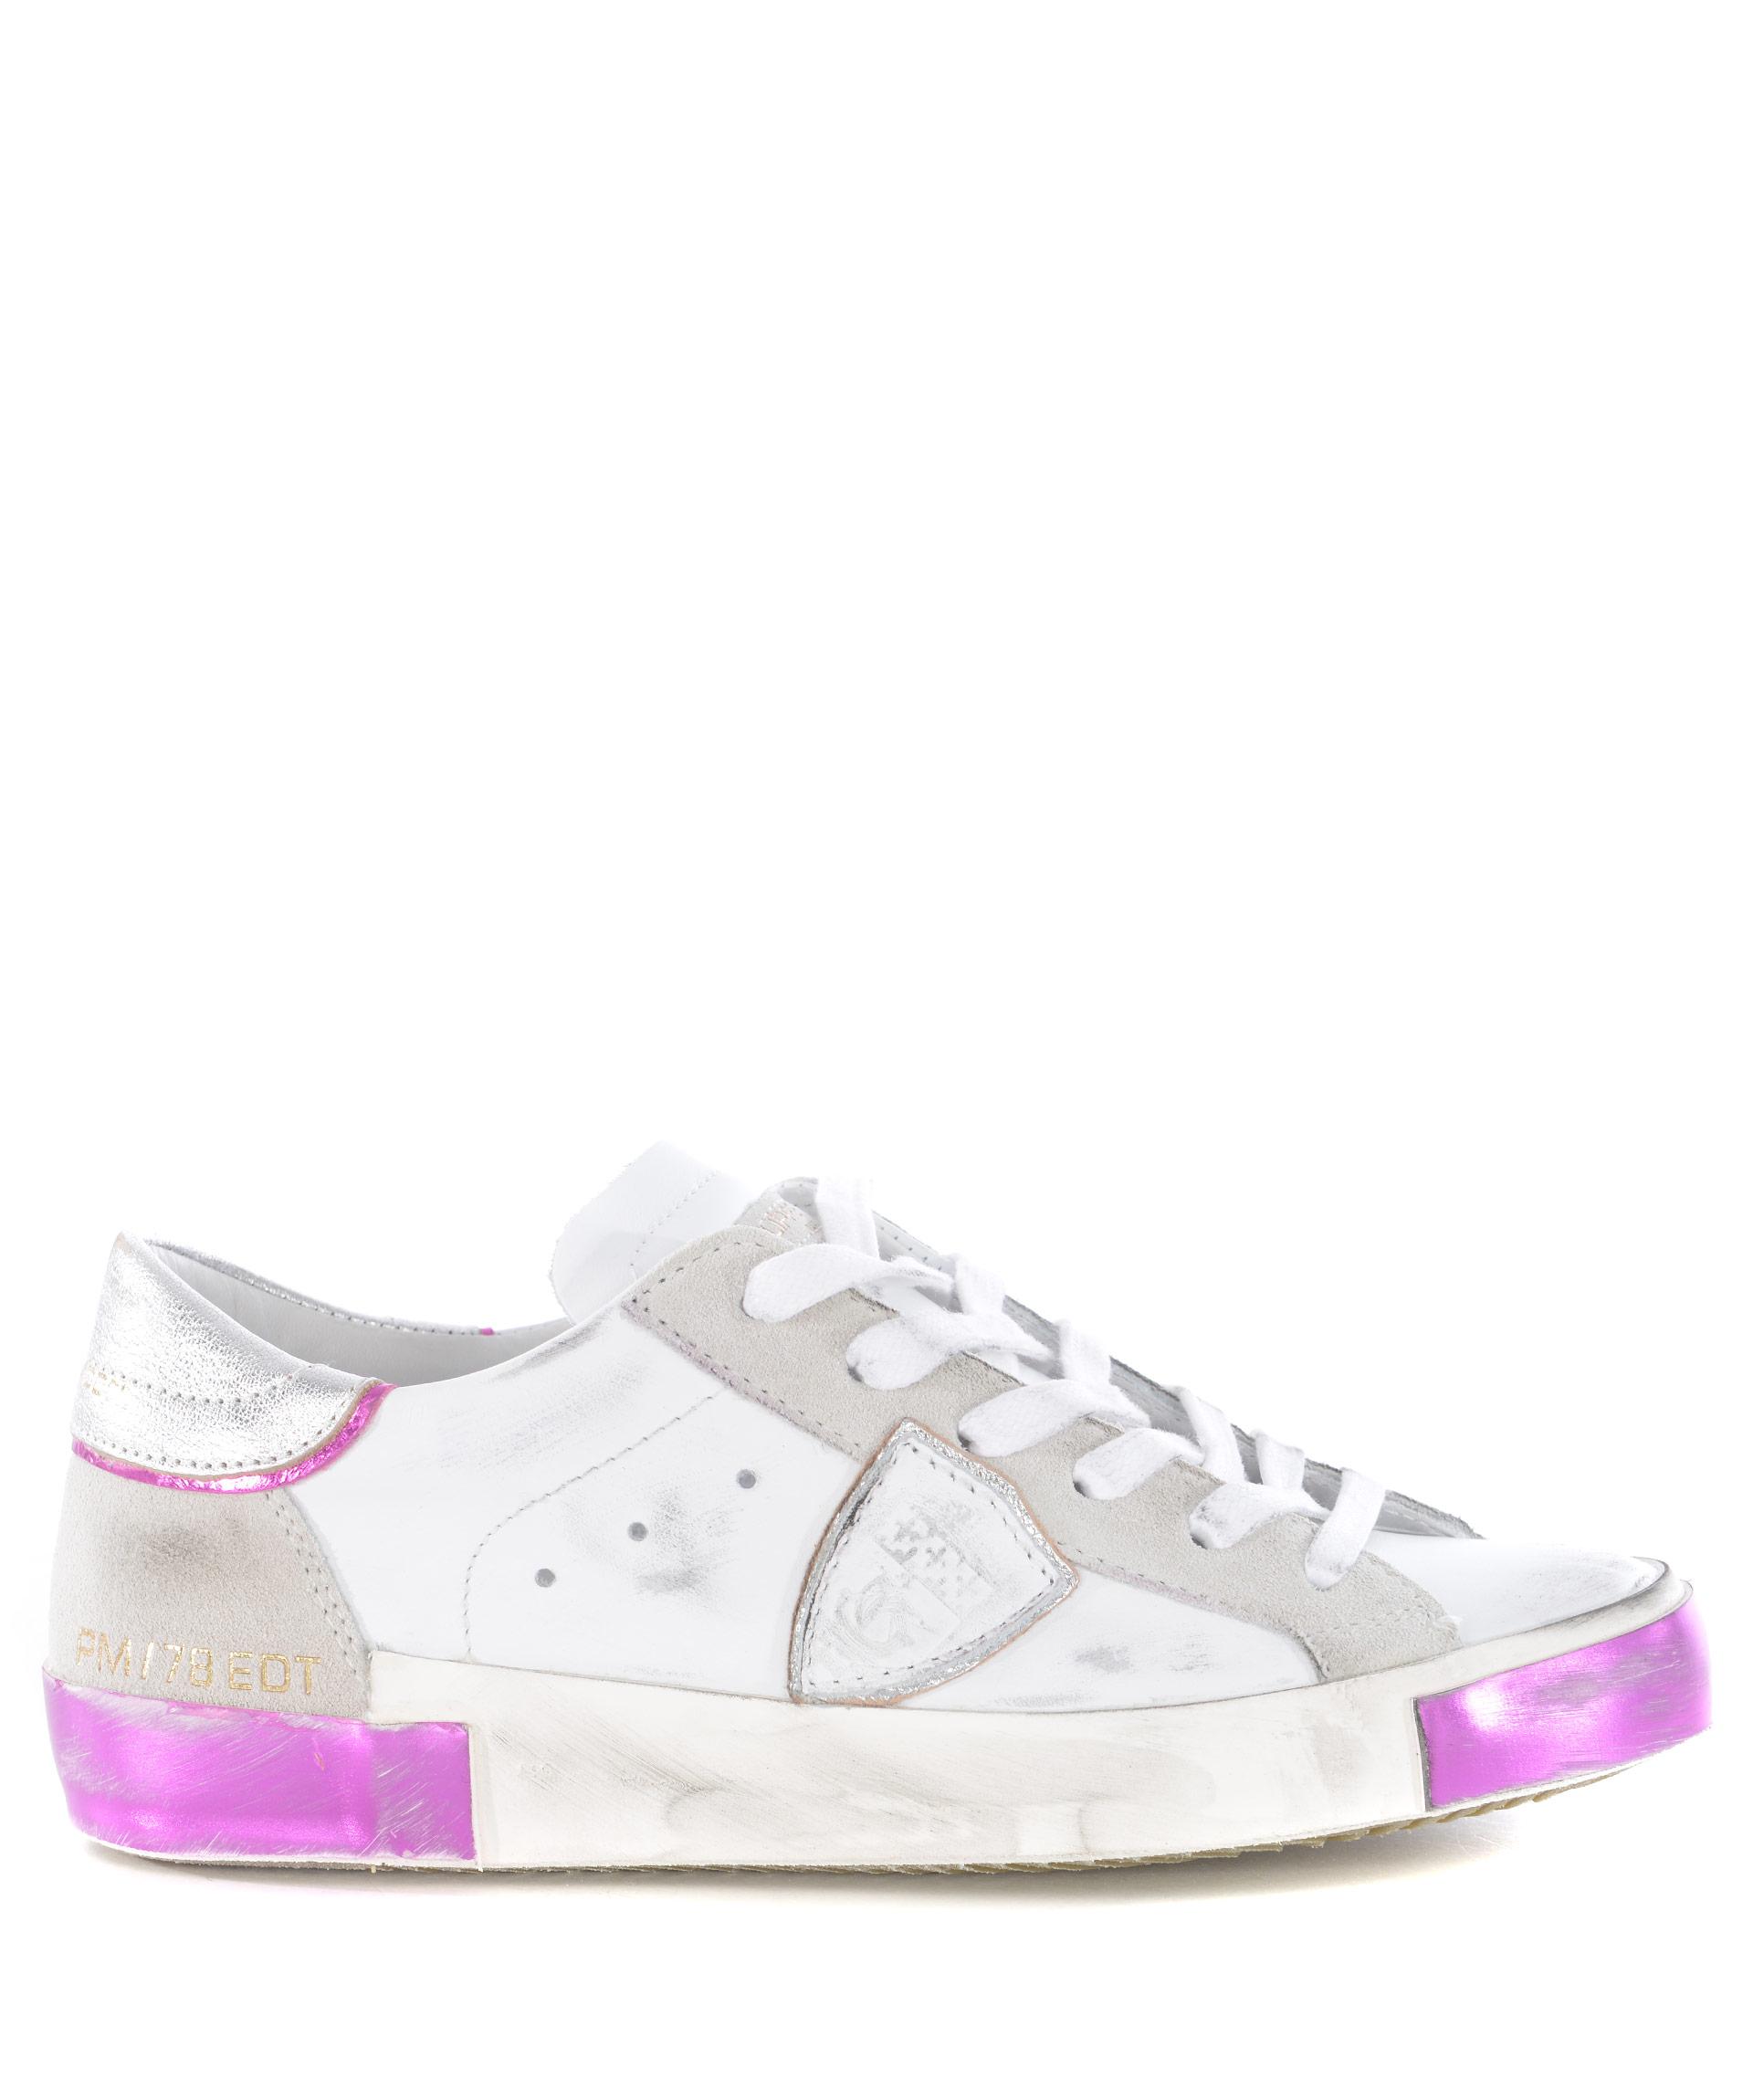 Sneakers uomo Philippe Model prld low